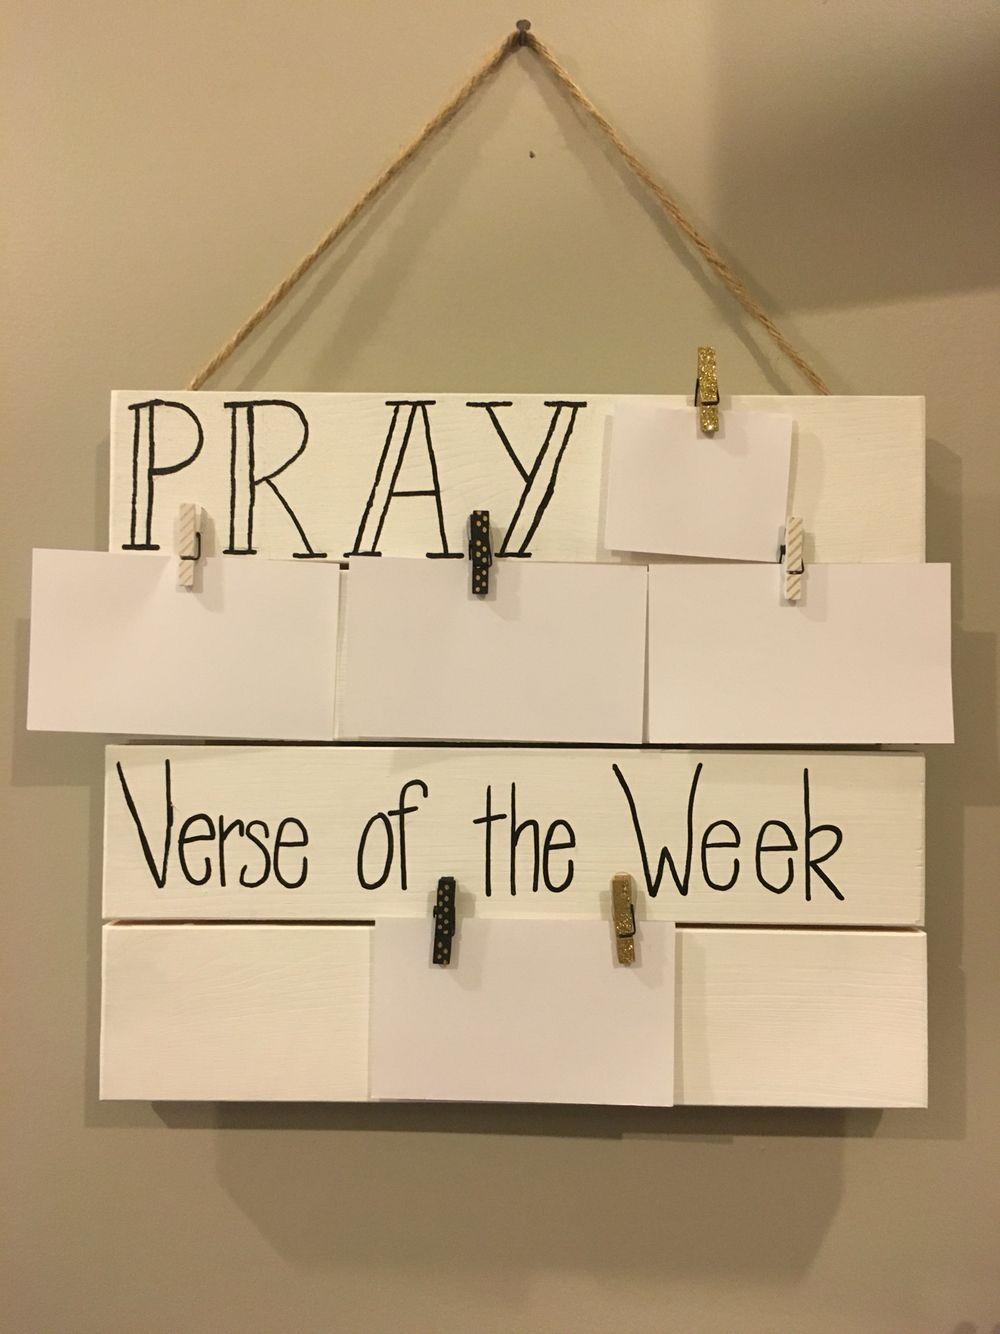 Prayer board Mini pallet from Hobby Lobby painted white